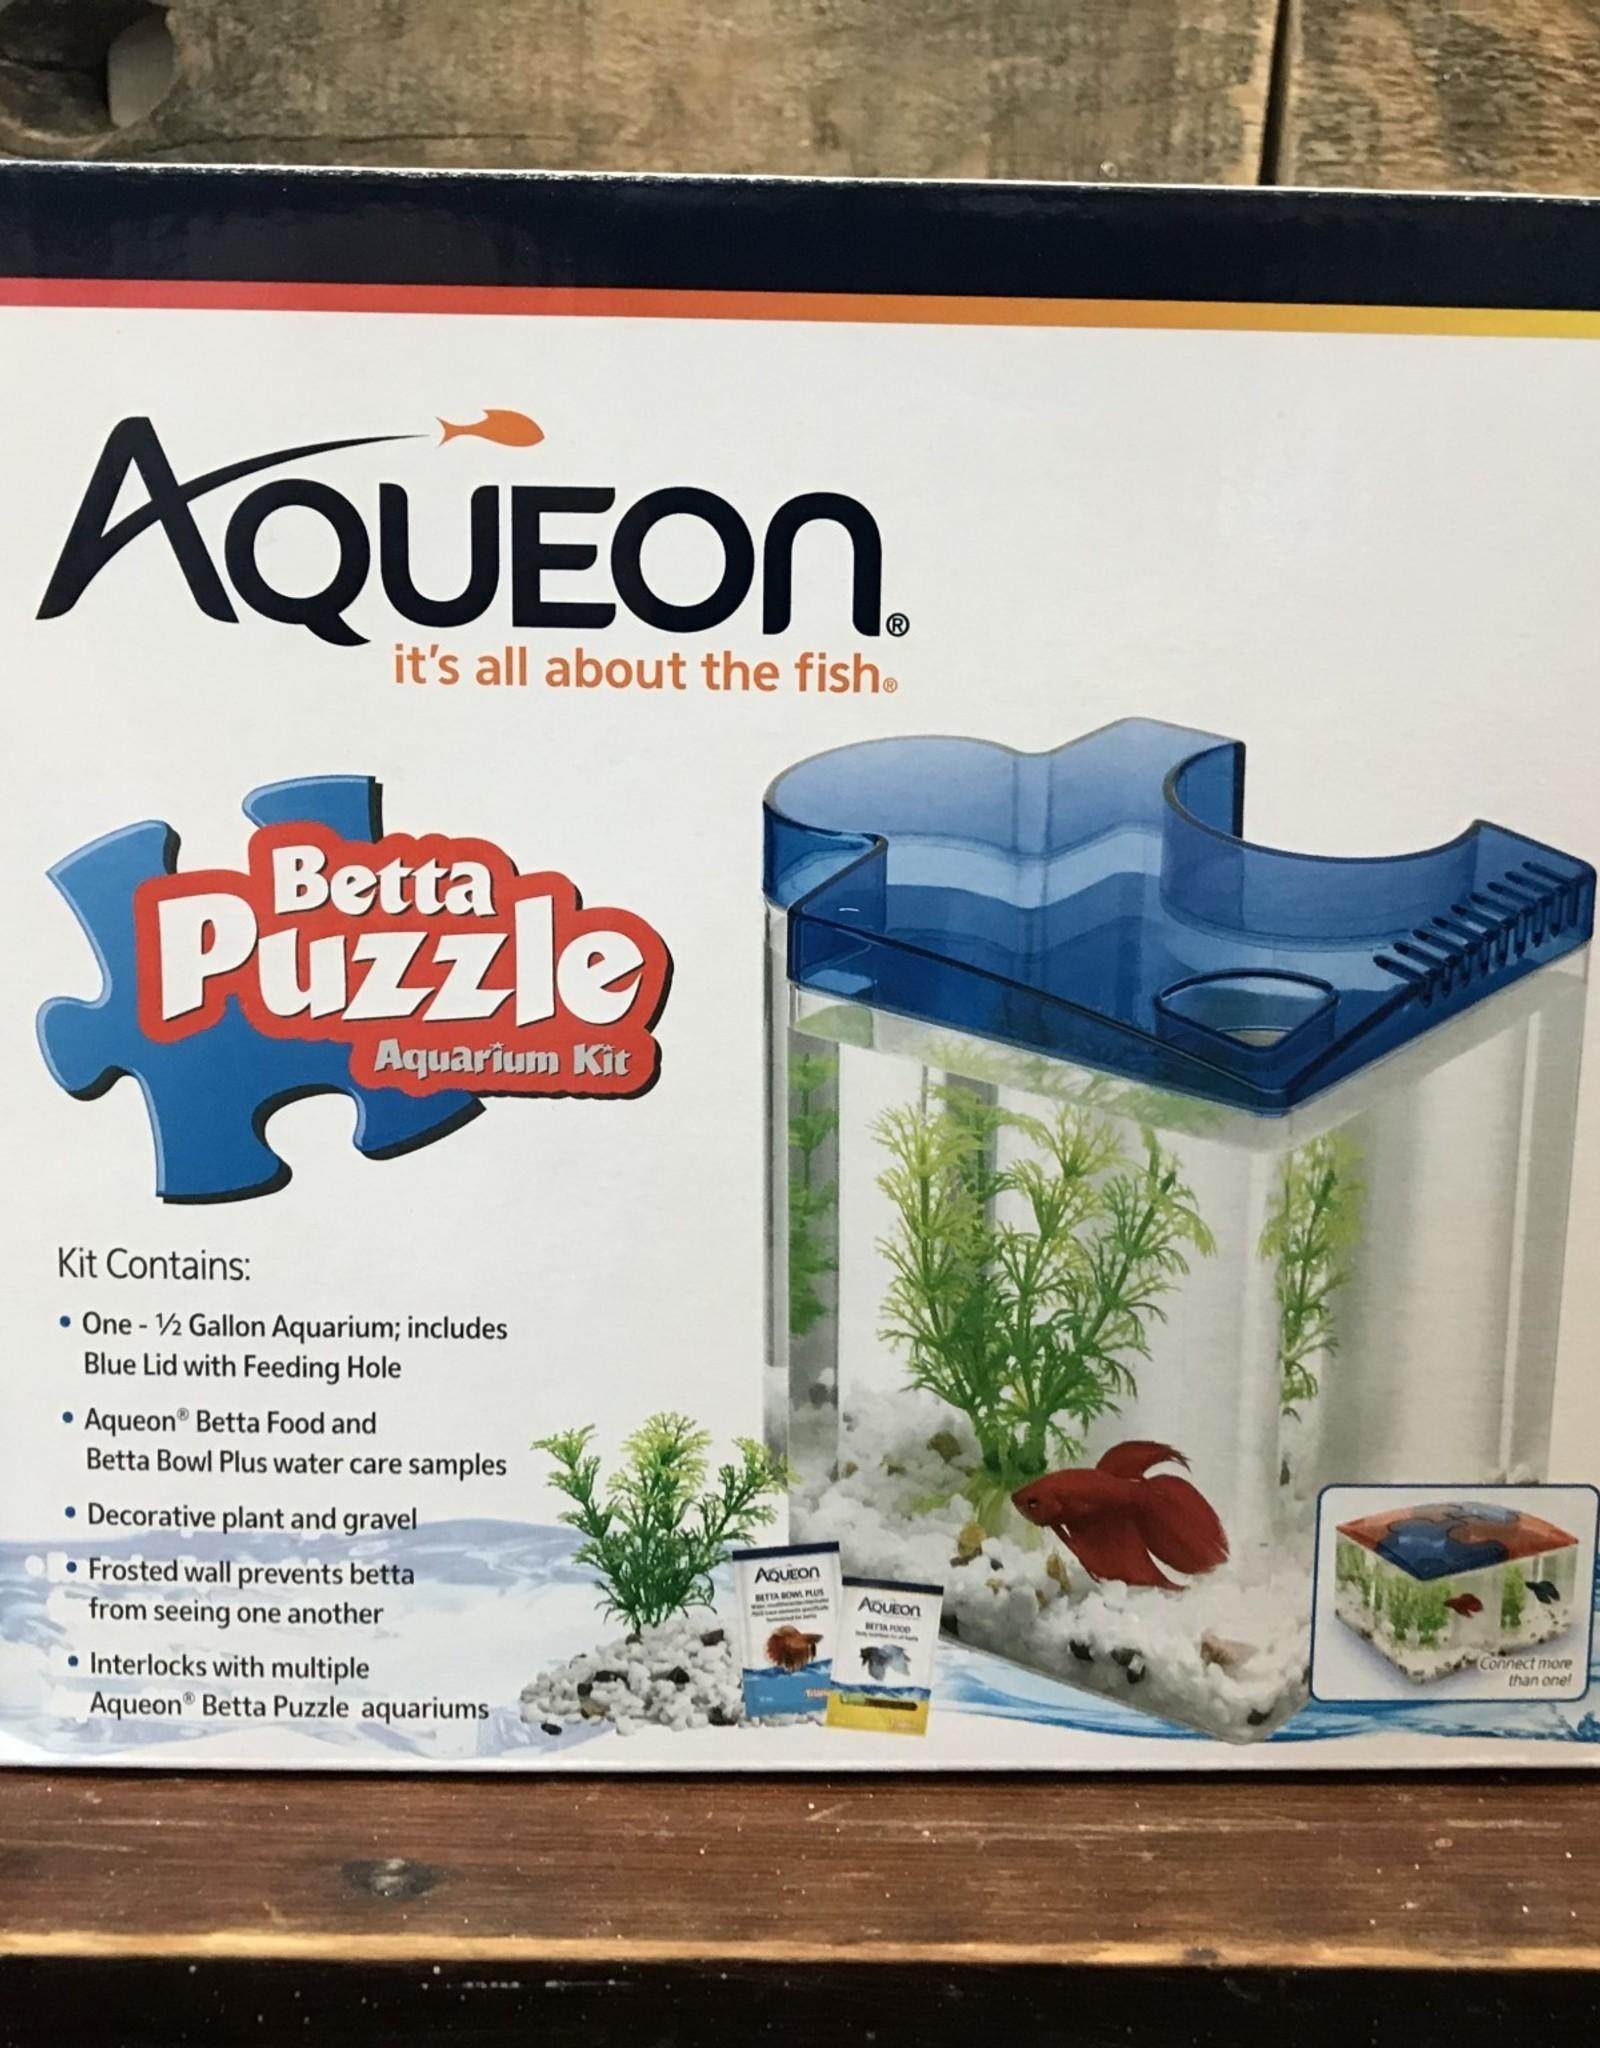 Aqueon kit betta puzzle blue .5 gal